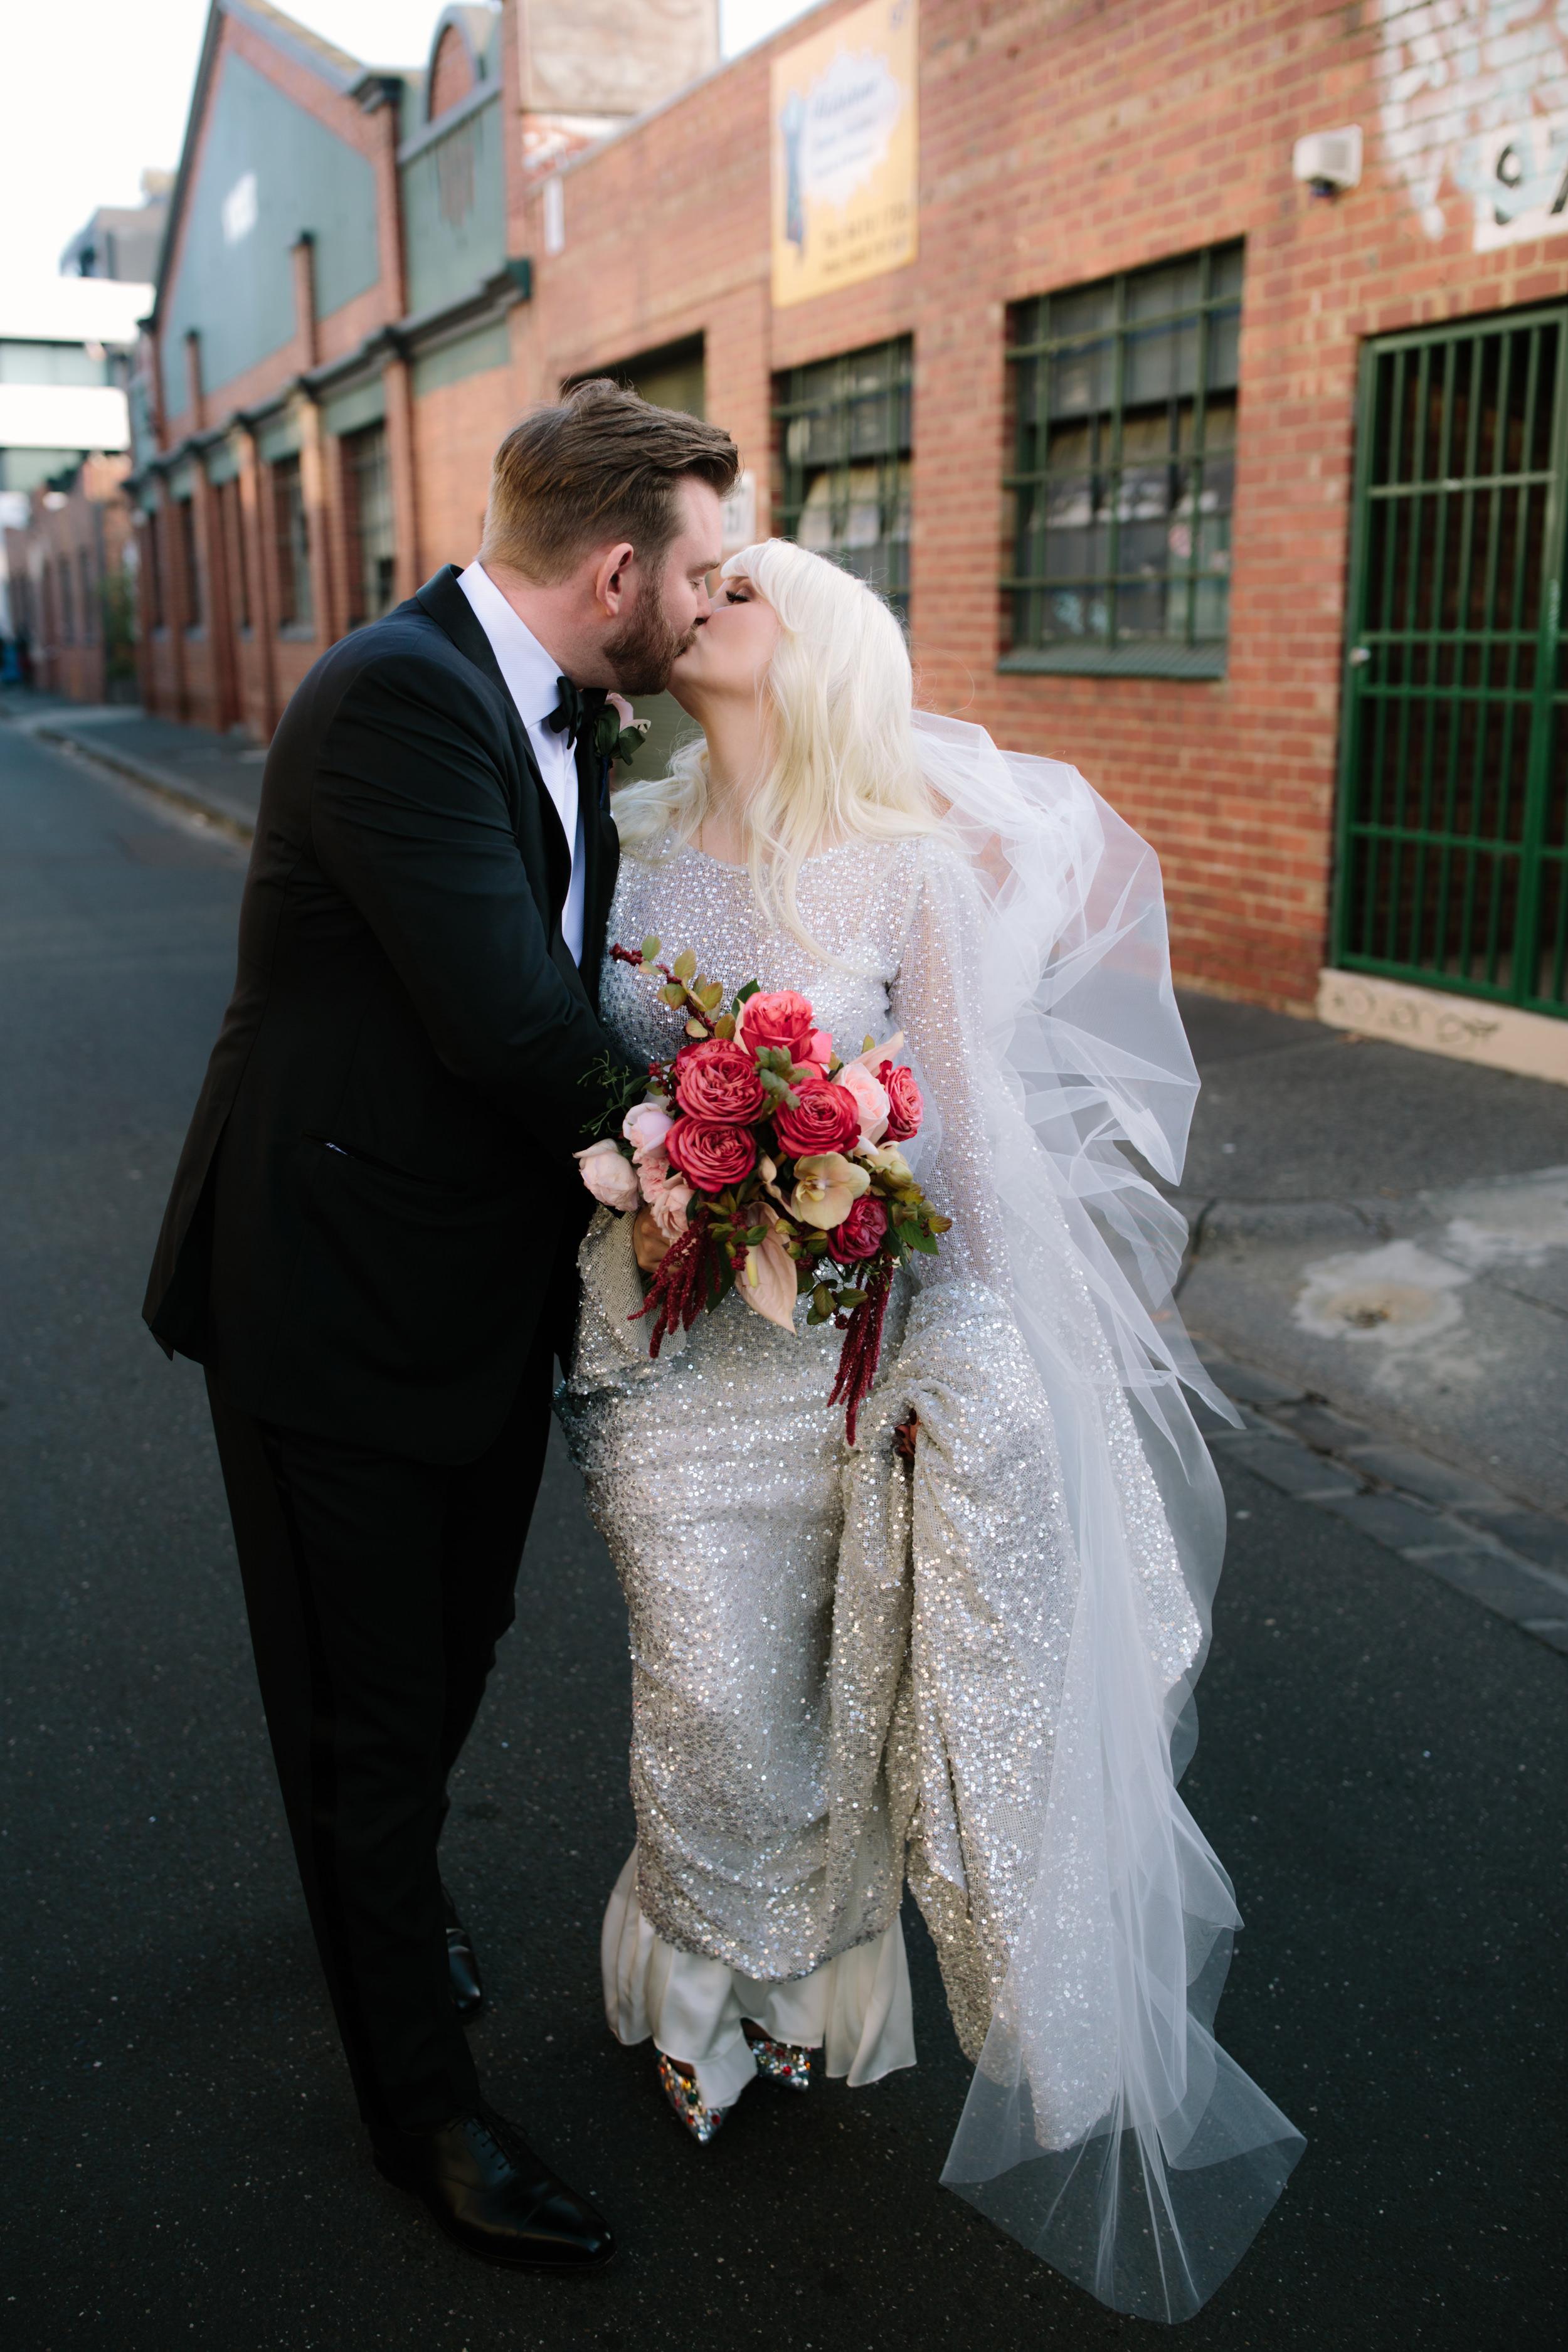 I-Got-You-Babe-Weddings-Tori-Will-Rupert0073.JPG